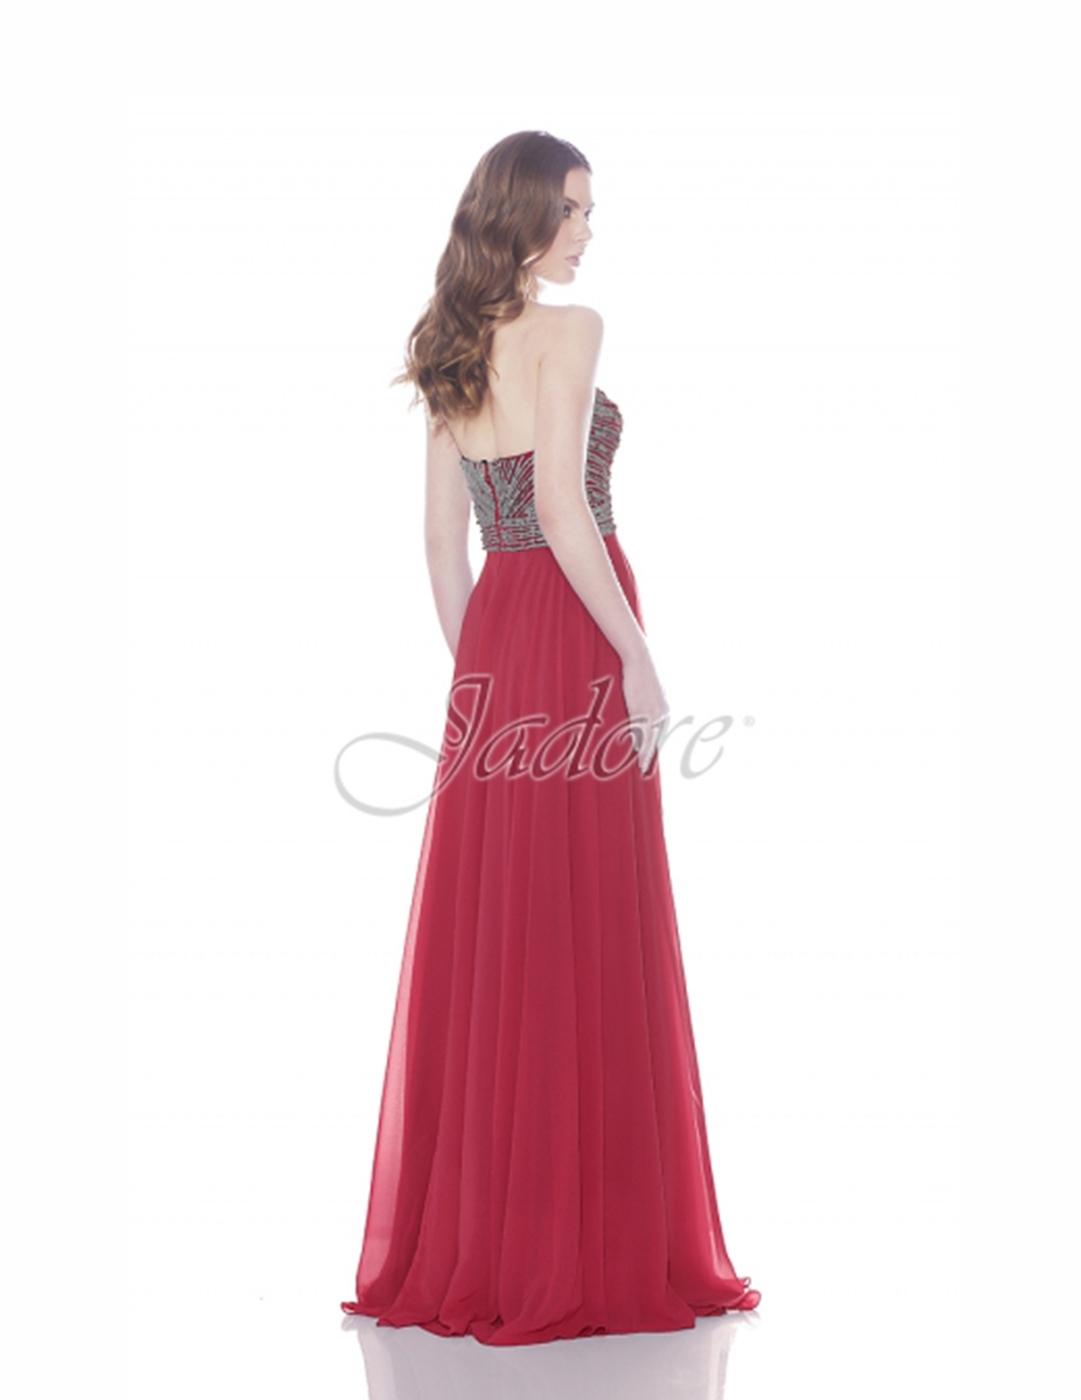 e4c55c89e18 Evening Dress by Jadore Jadore J7 Collection - J7061